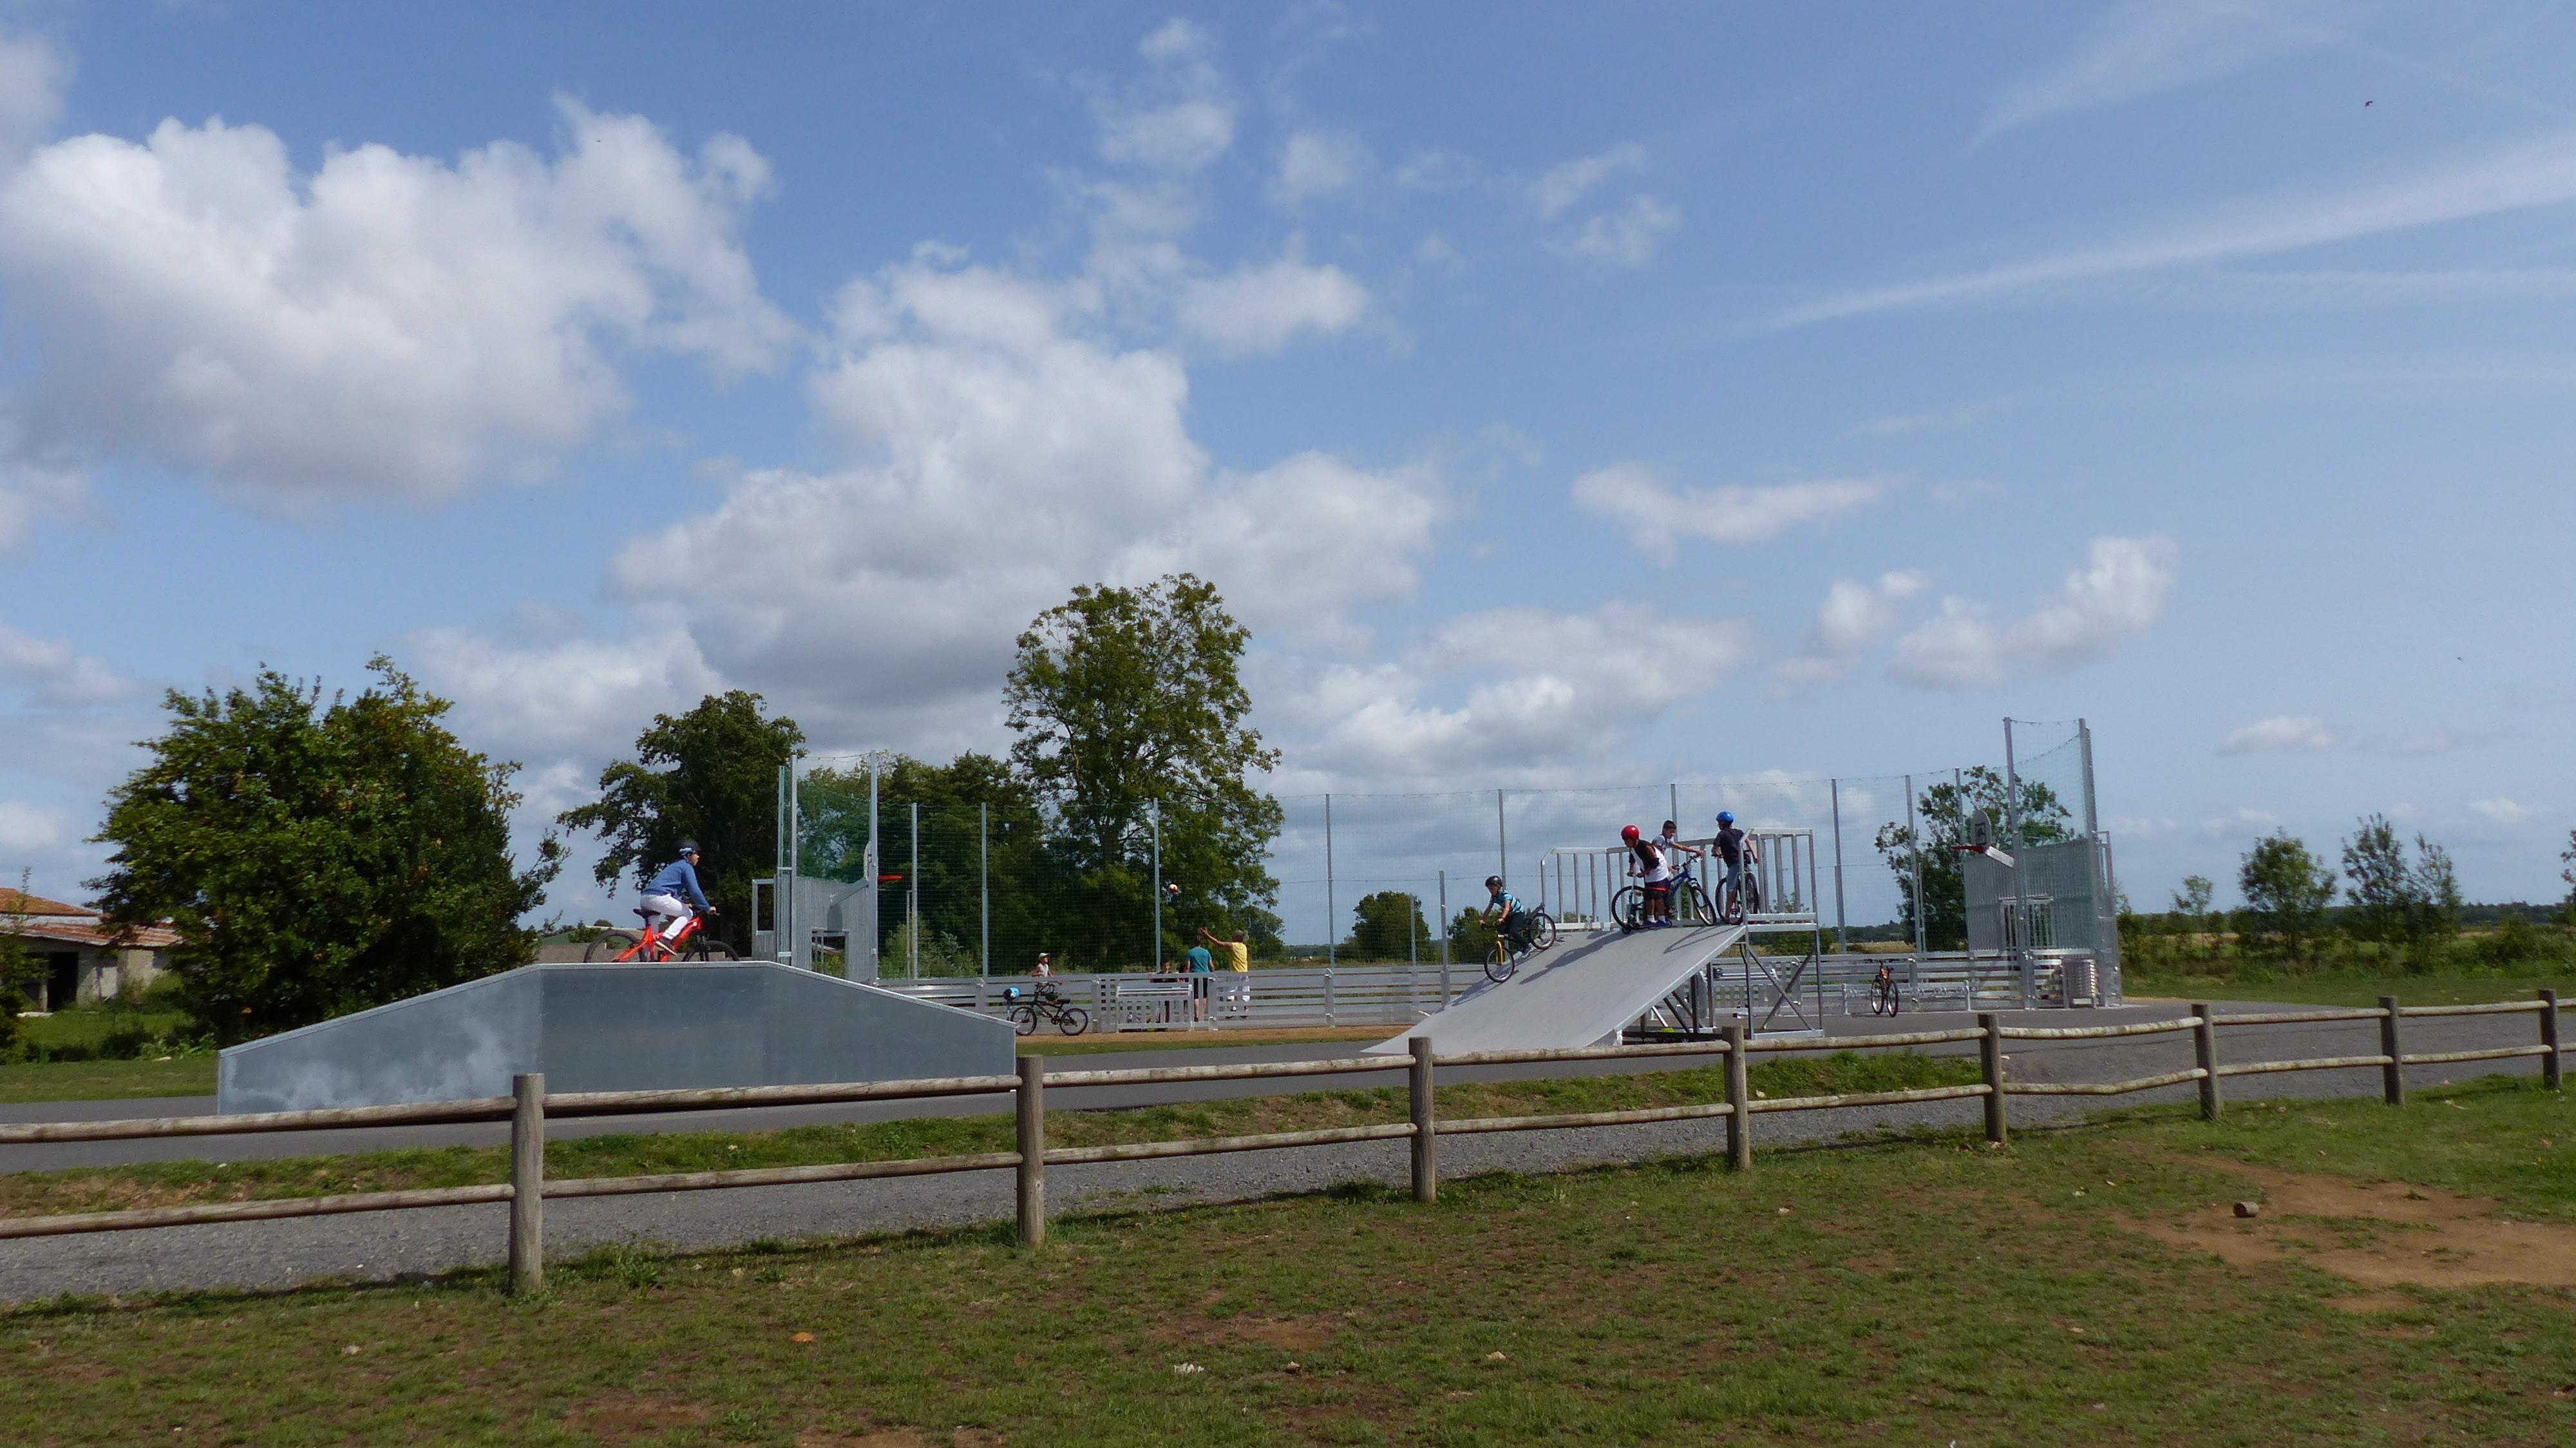 Le Skate Park